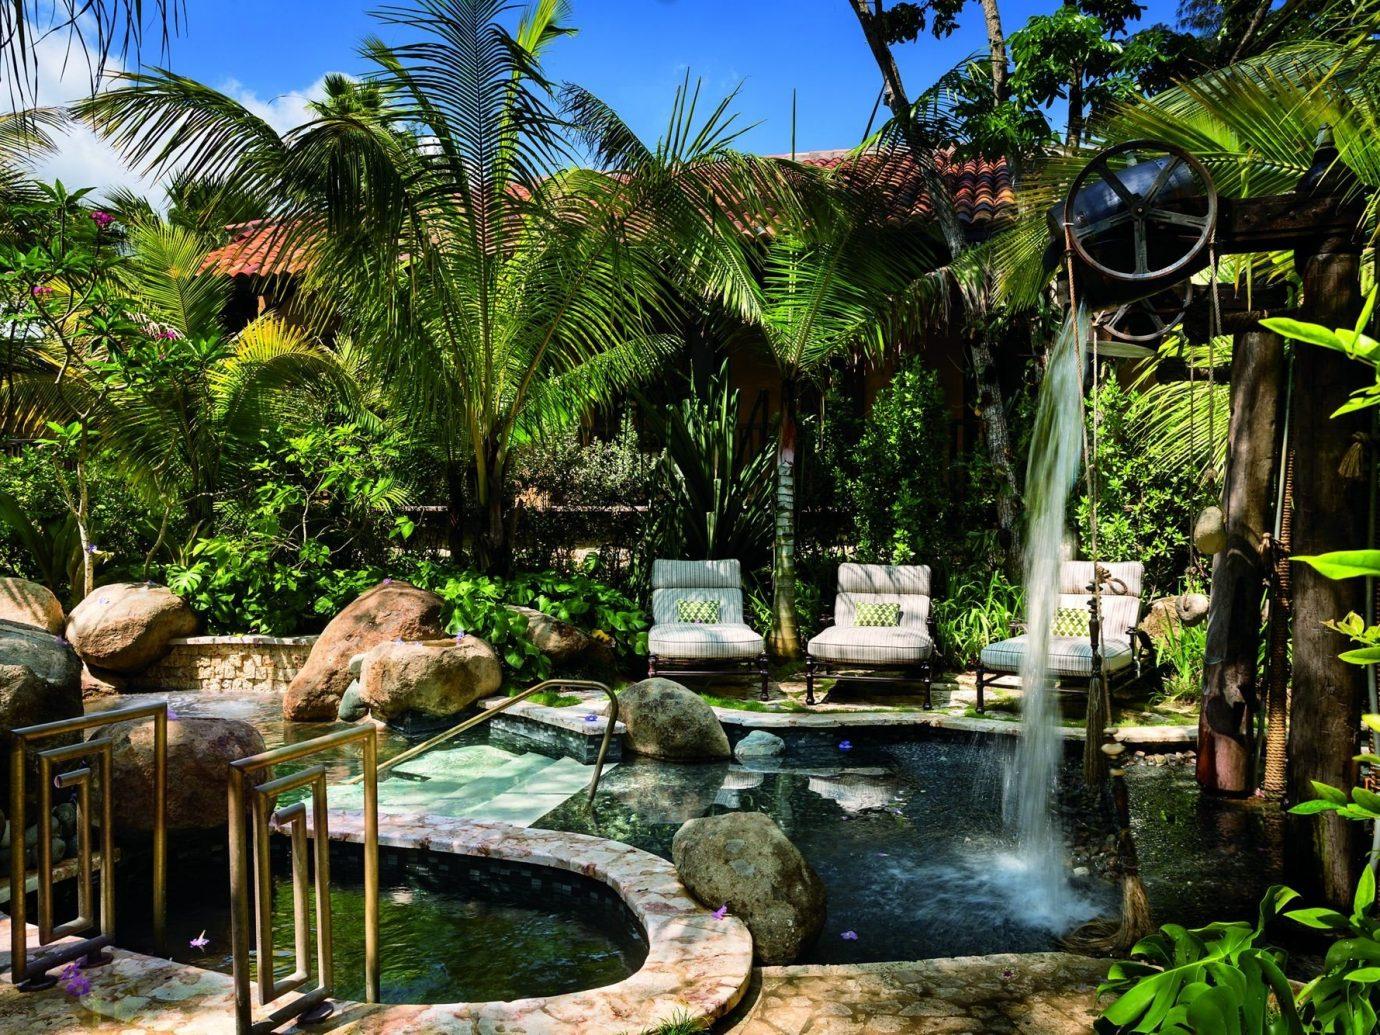 Hotels tree outdoor botany Jungle swimming pool Resort Garden arecales estate rainforest tropics plant backyard pond botanical garden flower palm